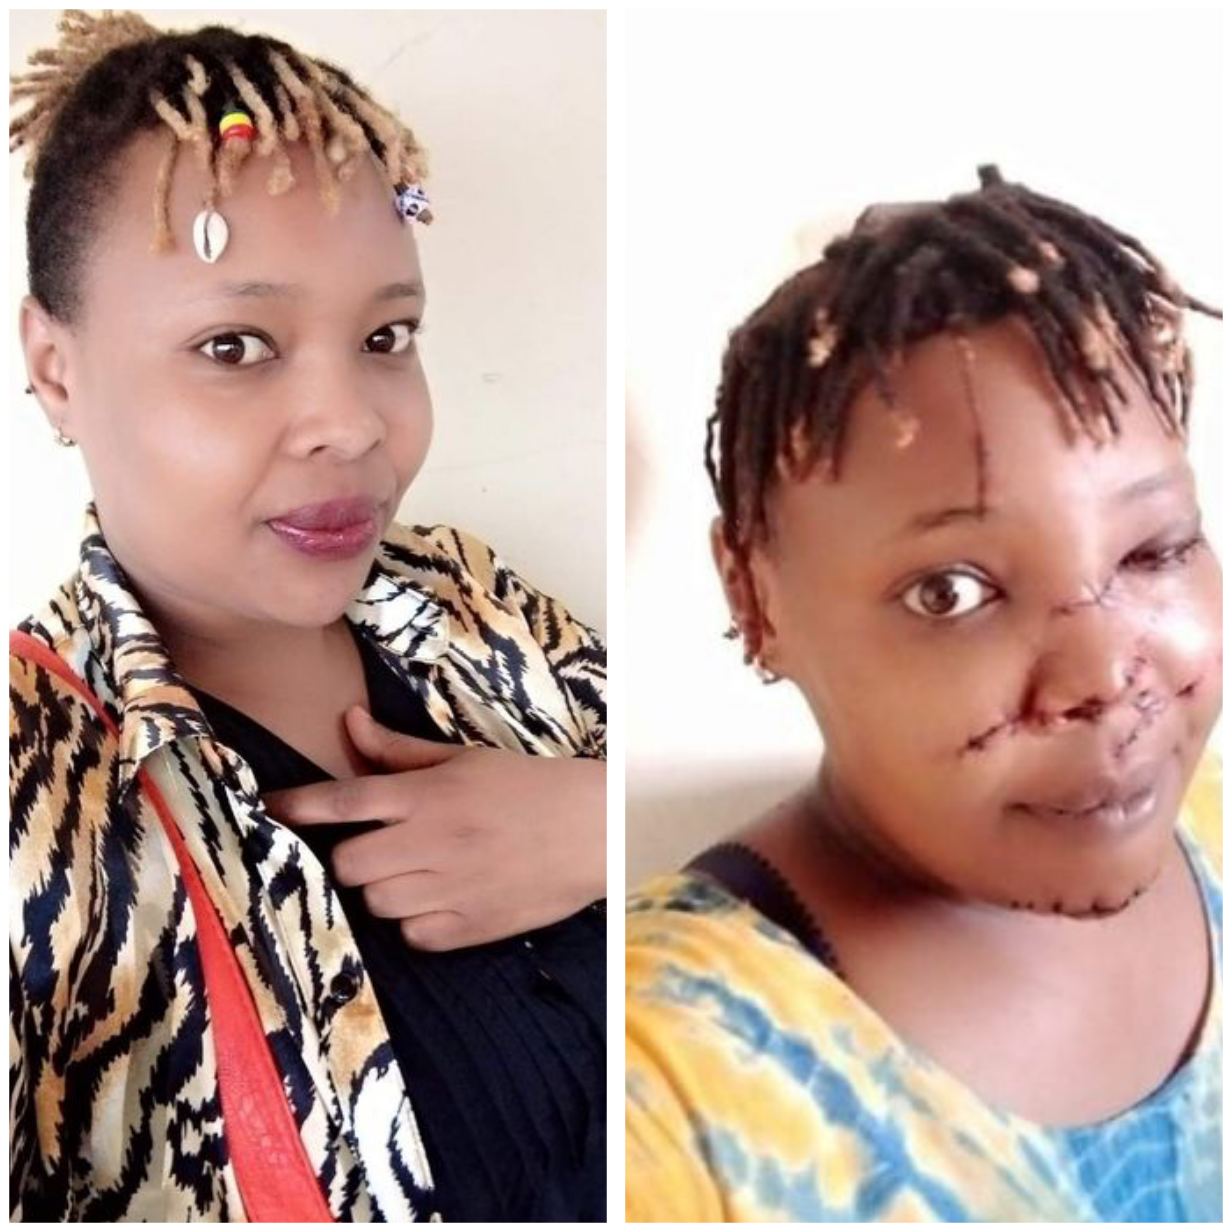 Kenyan man slashes ex-girlfriend's face with sword